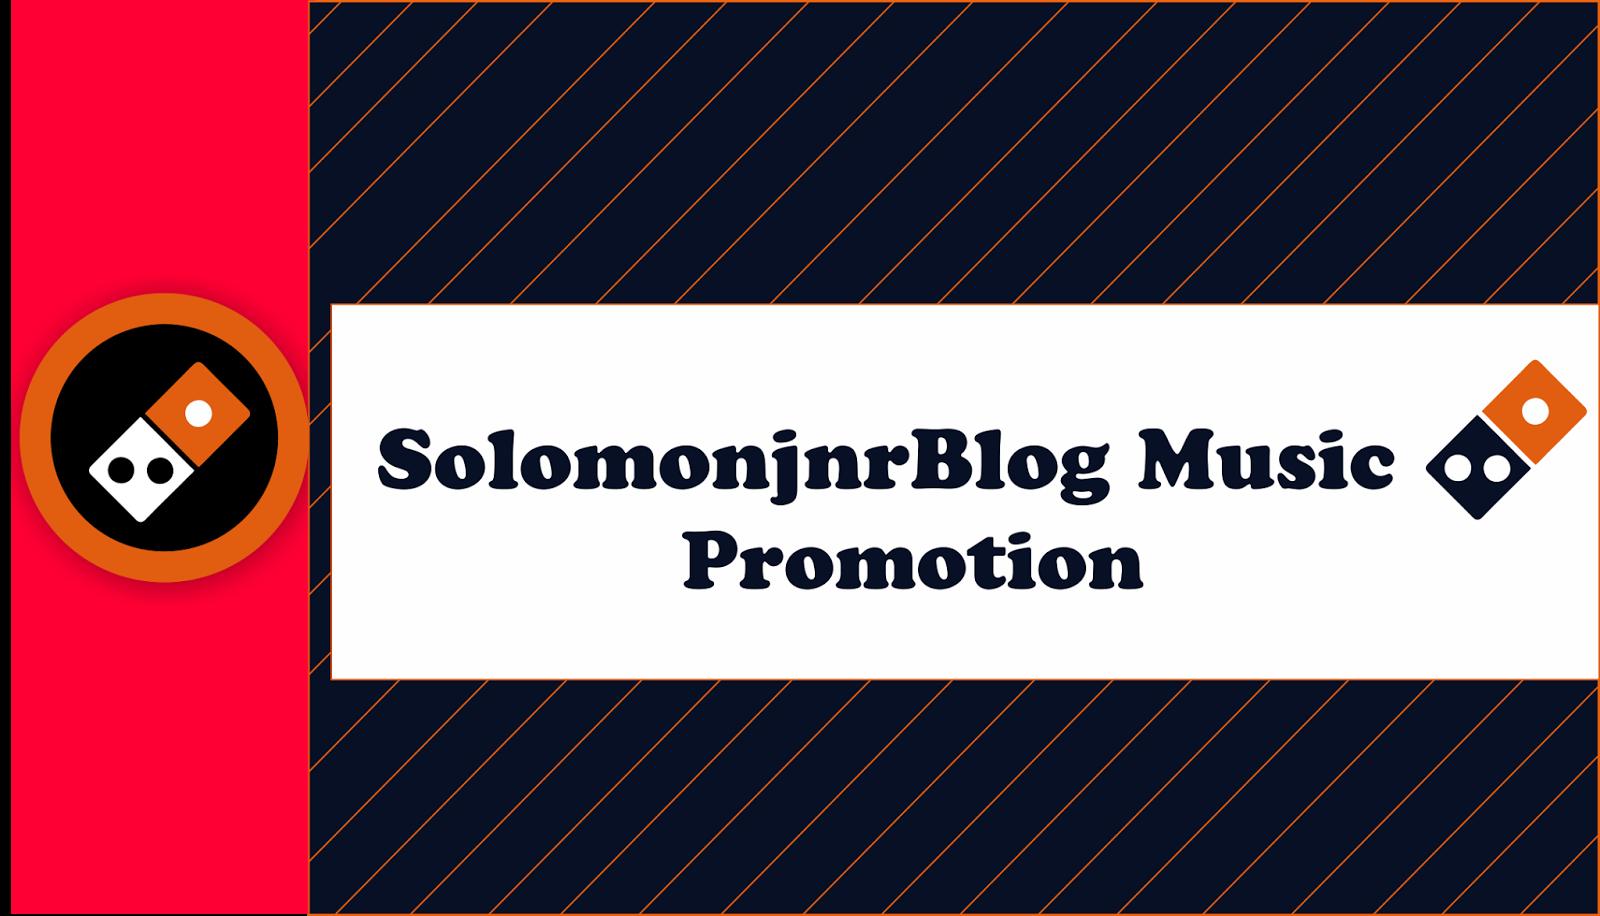 Music: We Pumping The Club by Sopie Tee - Solomonjnr